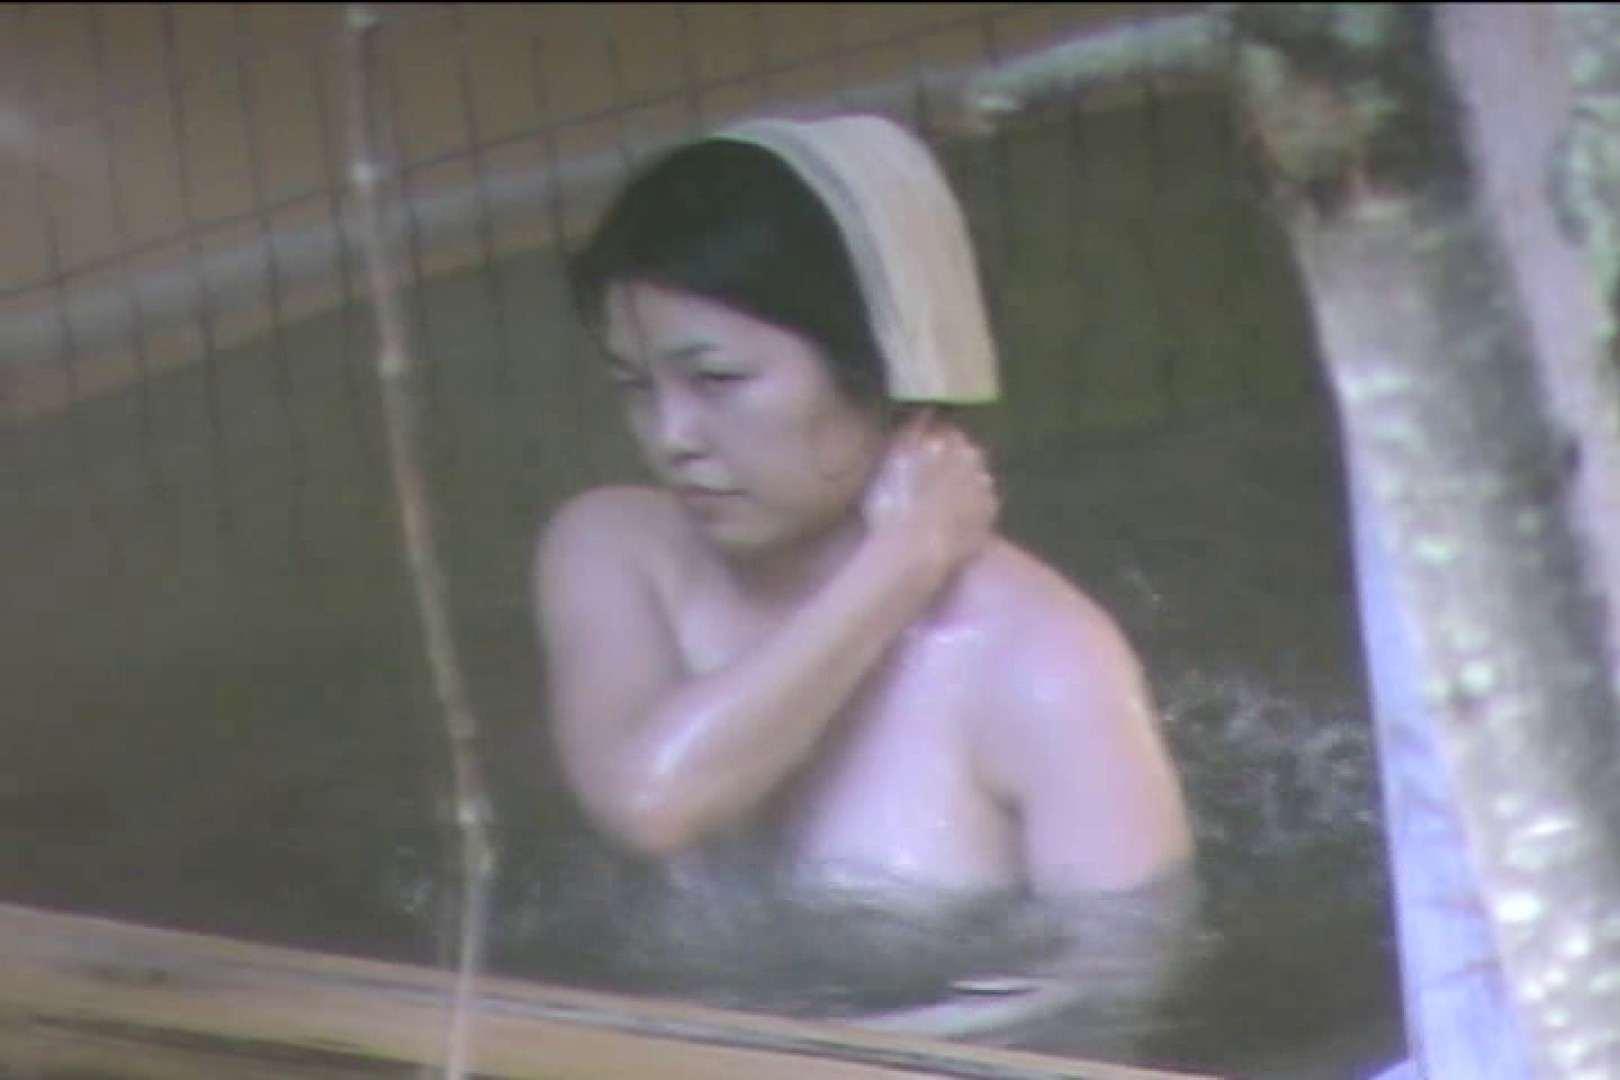 Aquaな露天風呂Vol.451 露天風呂編  104PIX 30